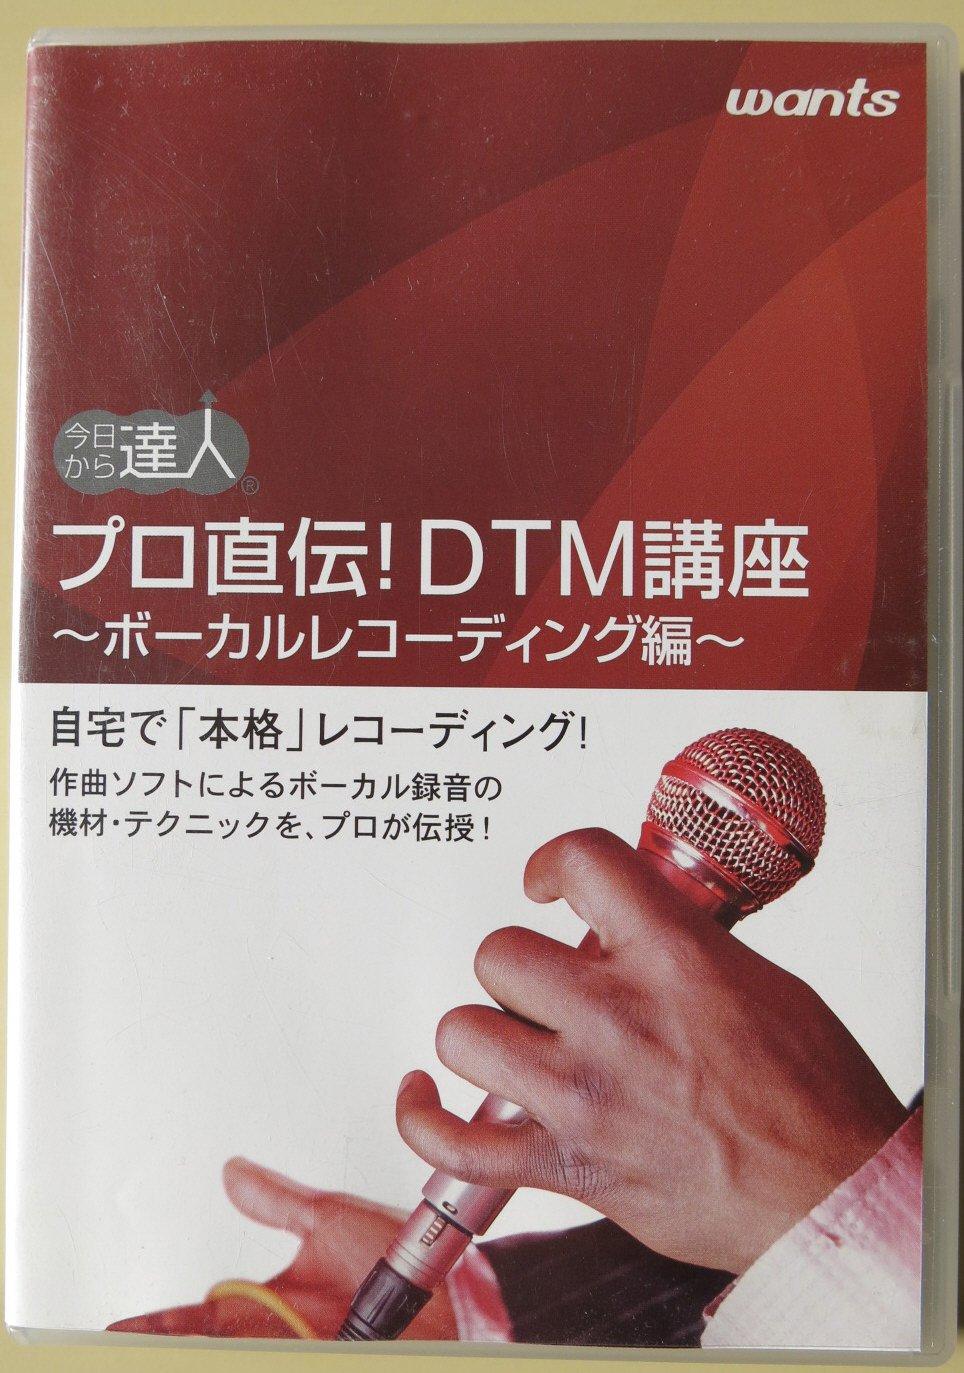 DTM講座:ボーカルレコーディング編 B003CNNNGK Parent